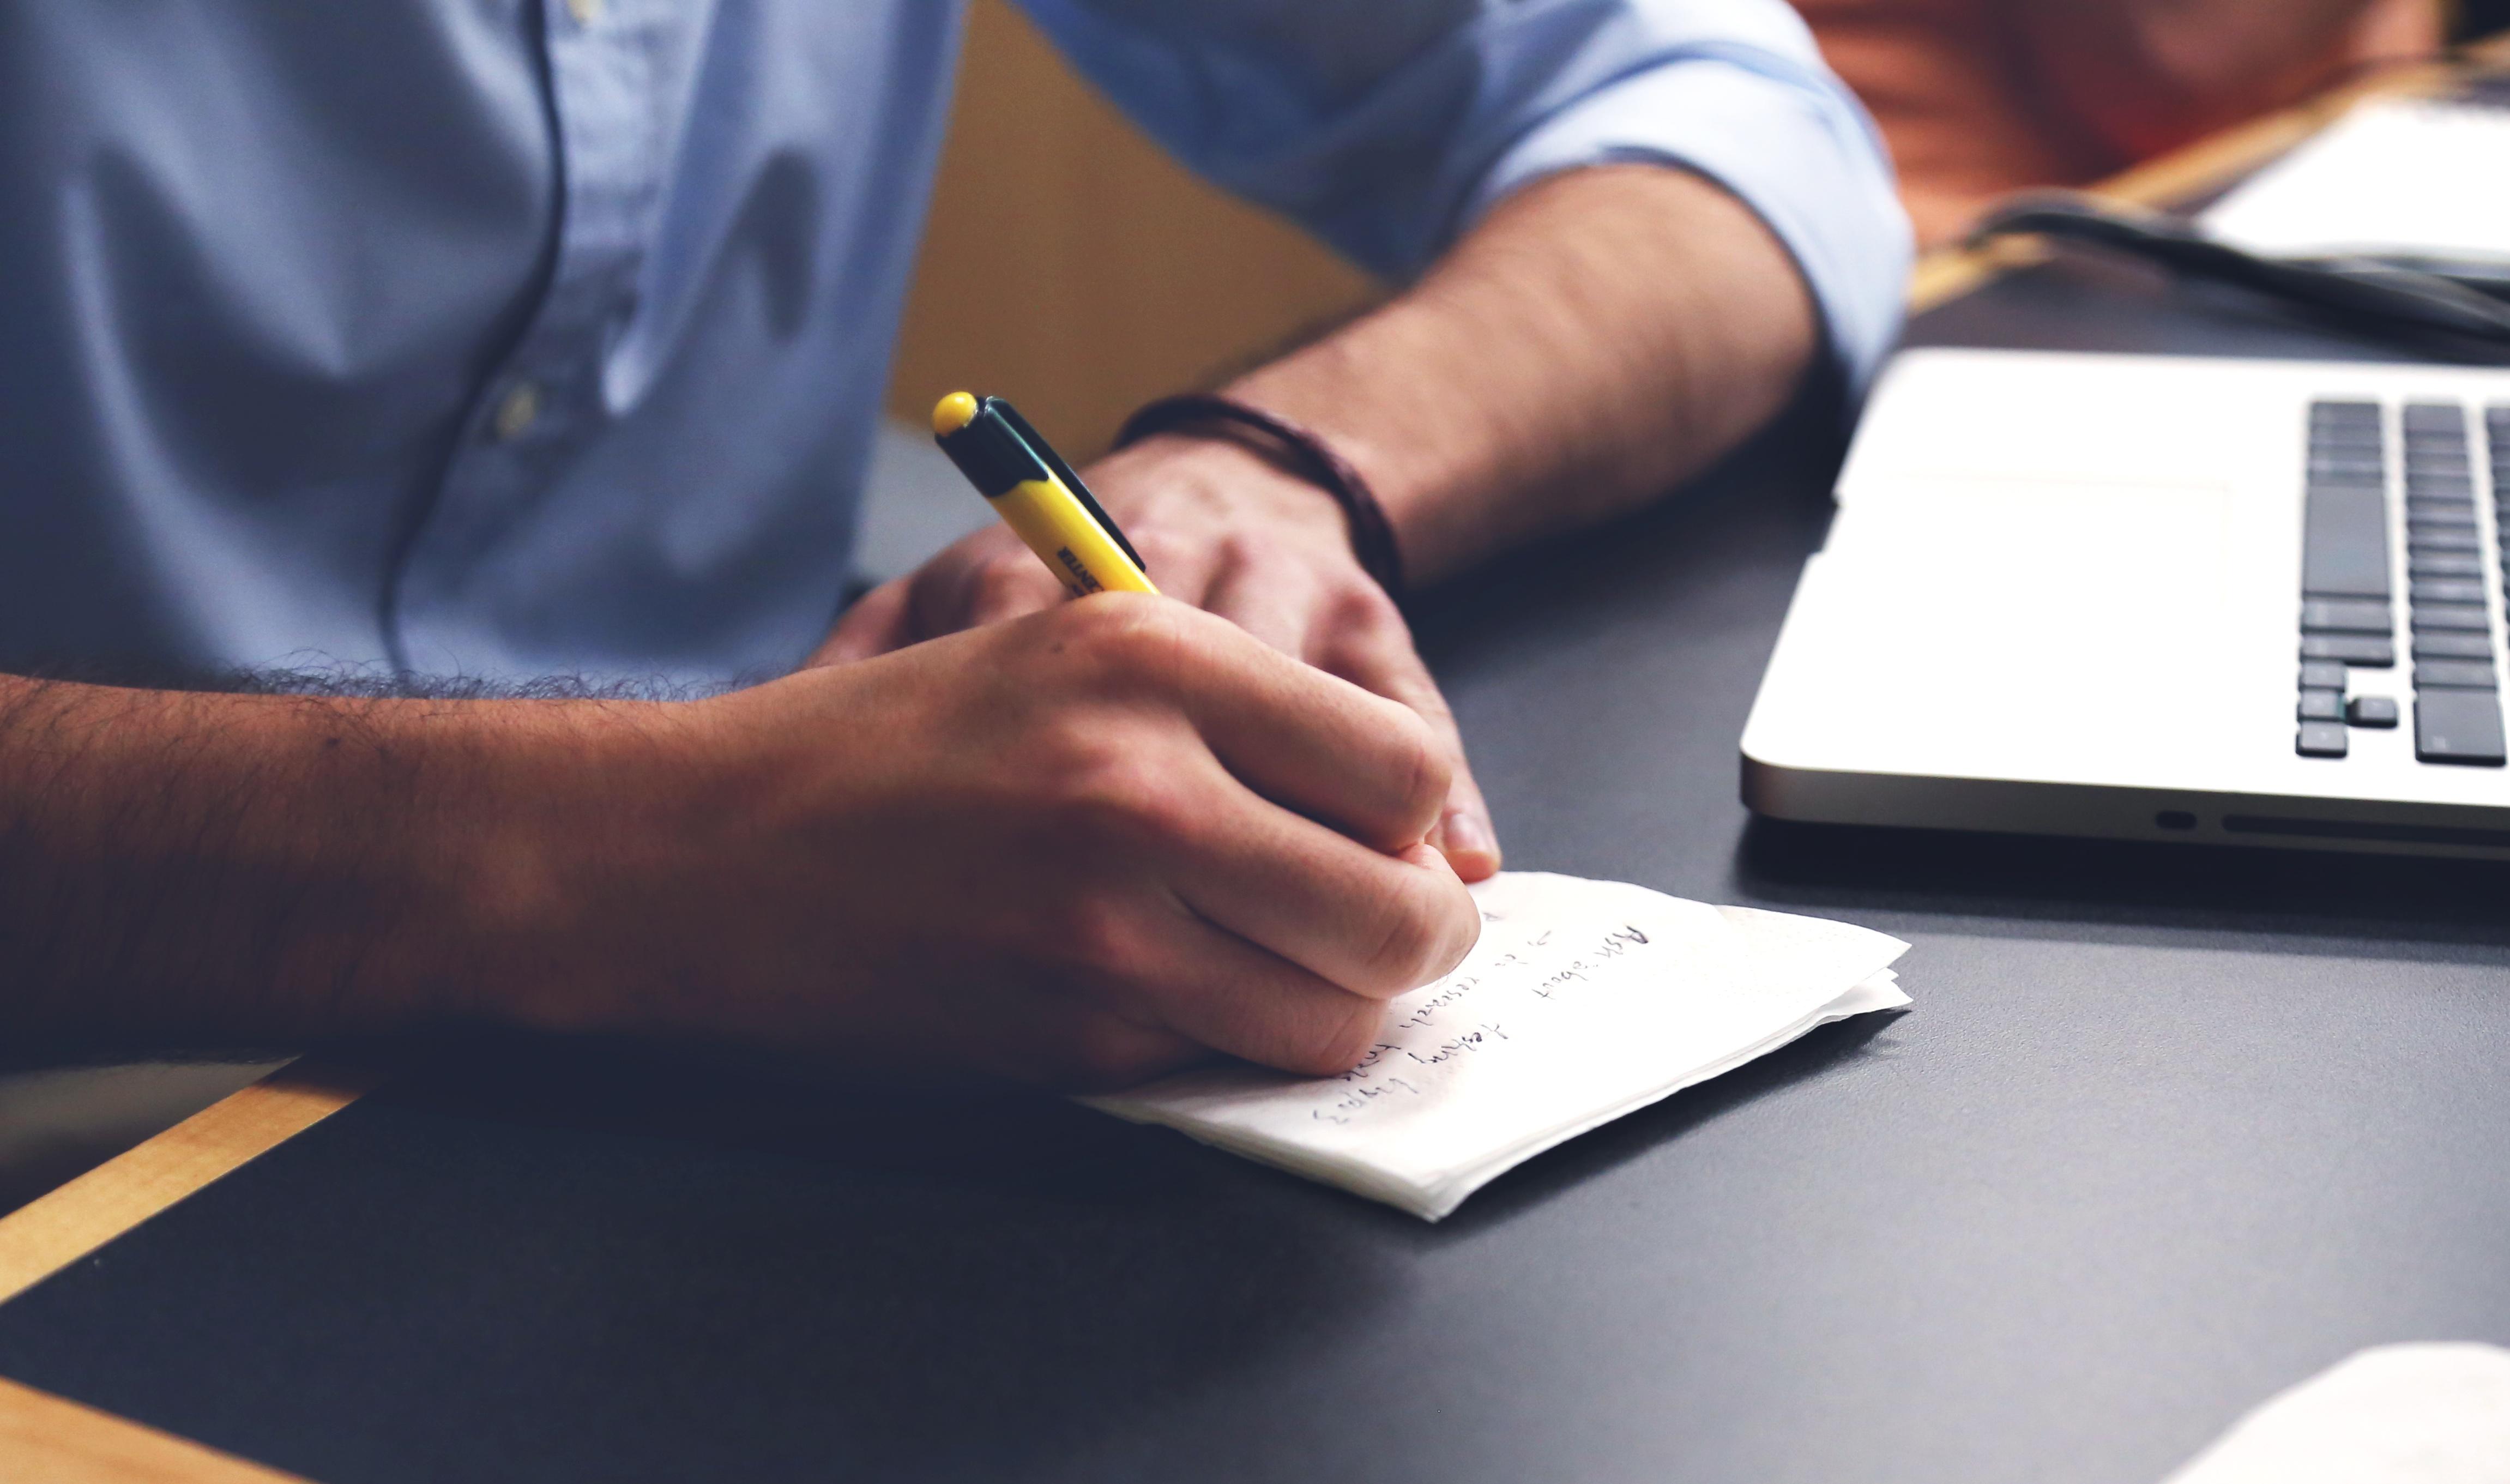 Blog17_Pexels_writing-notes-idea-conference.jpg